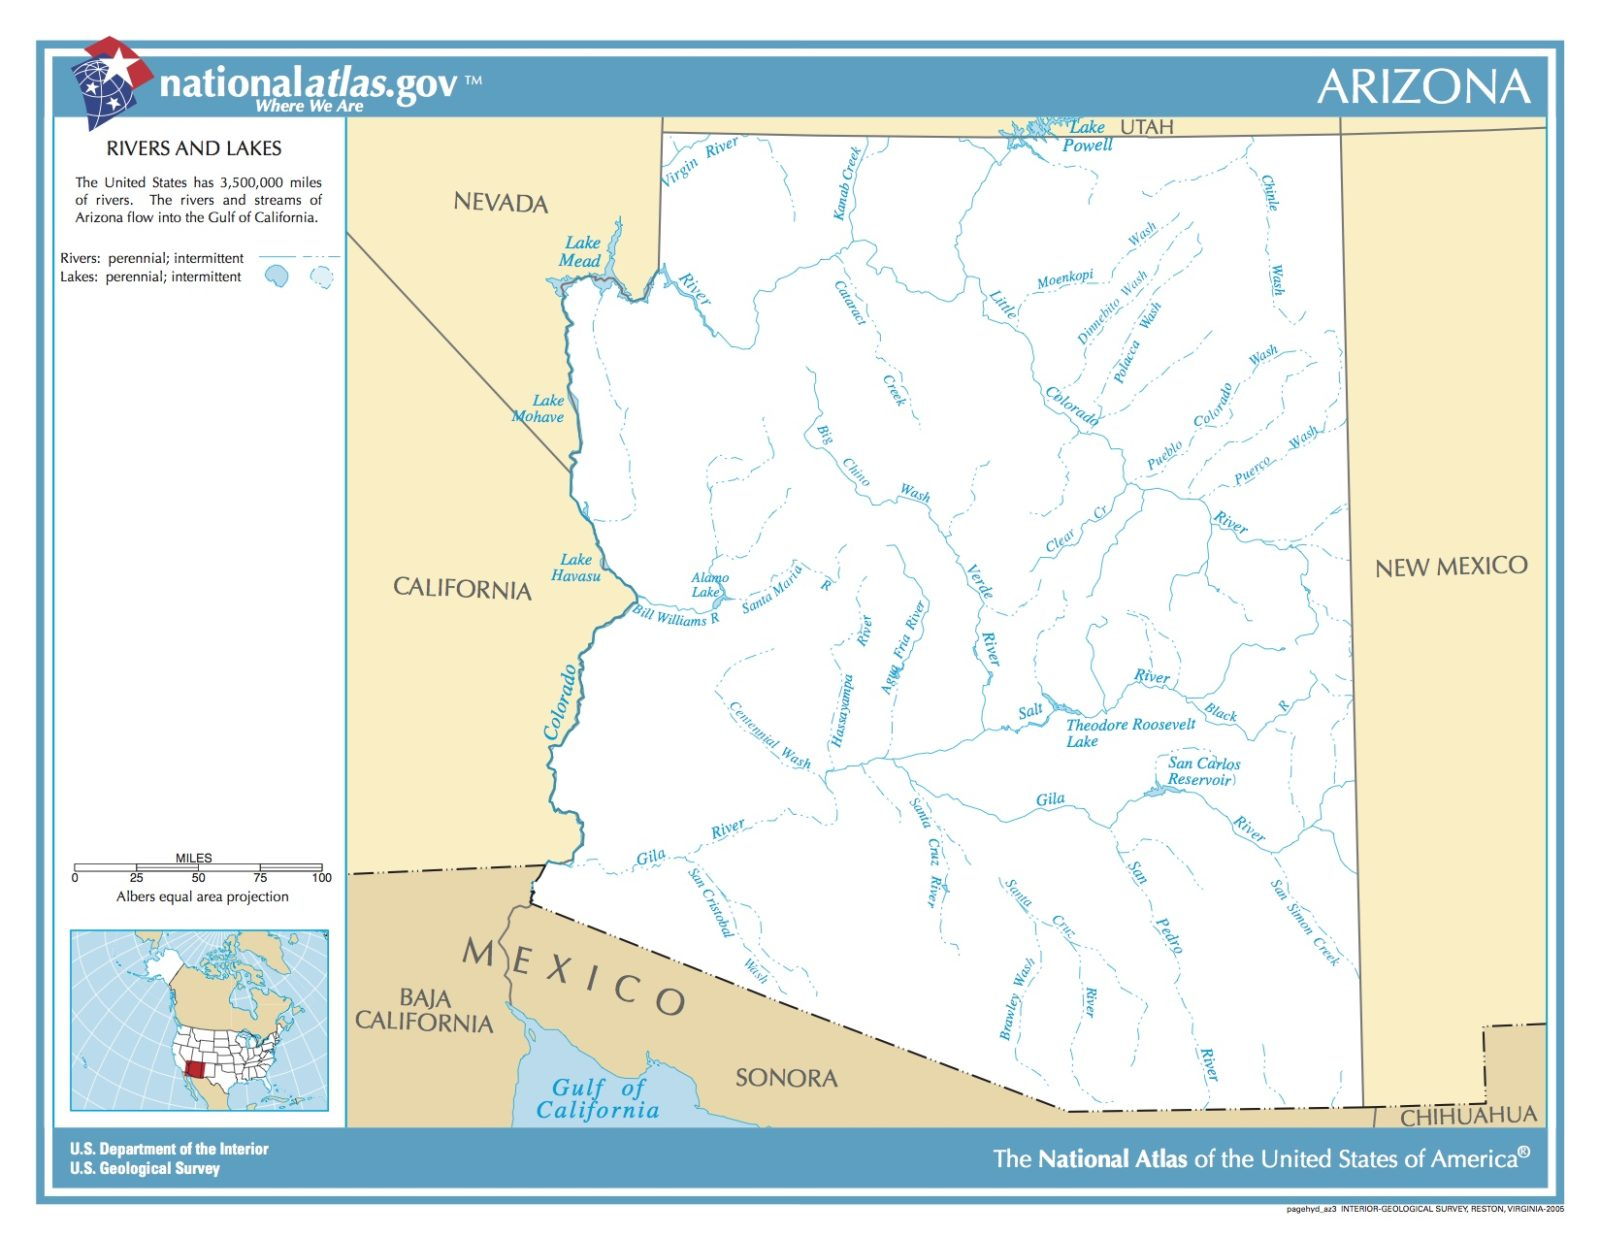 Map Of Arizona Rivers.Map Of Arizona Rivers And Lakes Picryl Public Domain Image